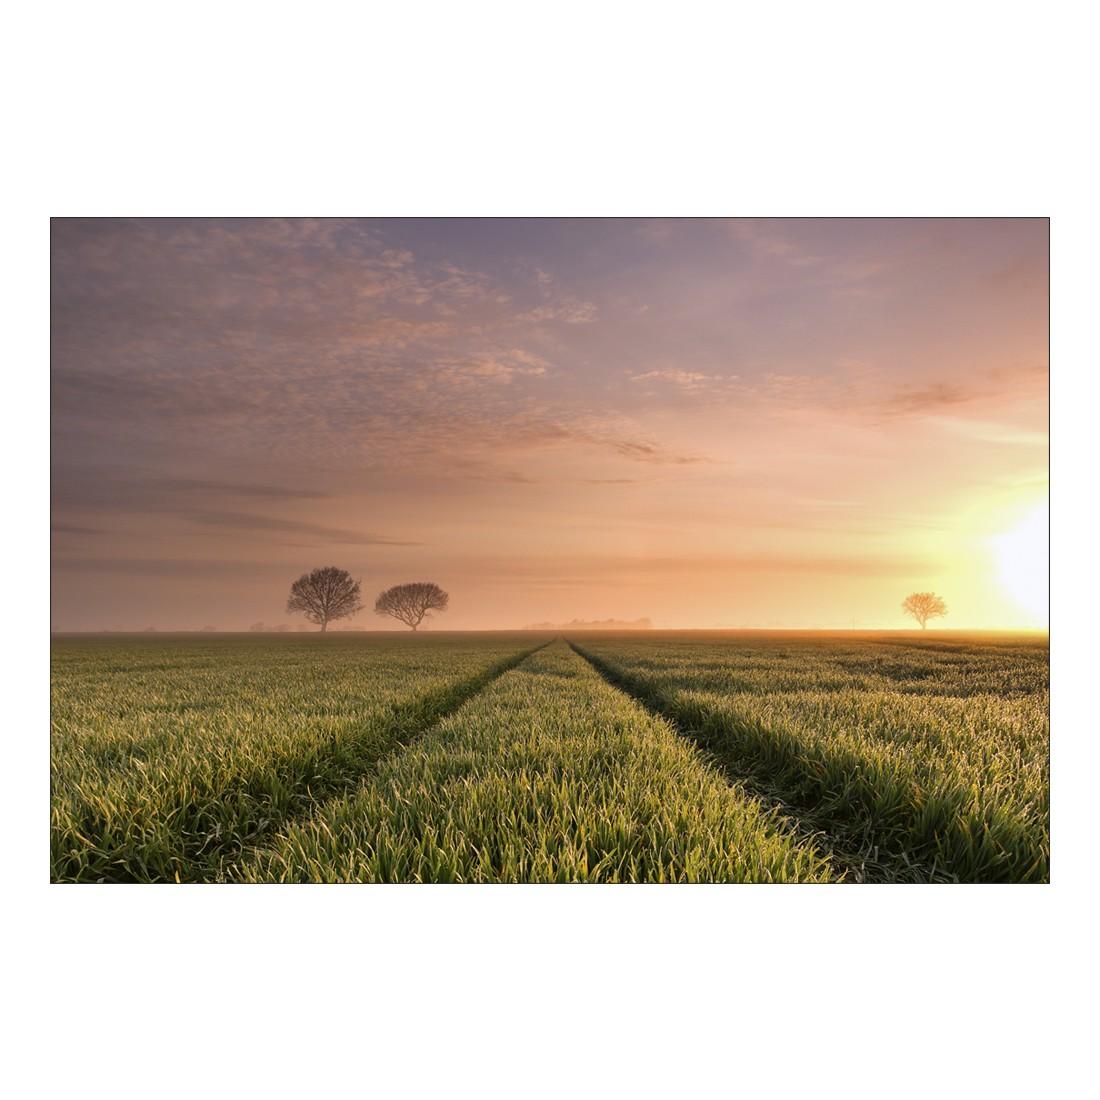 Acrylglasbild Foggy Sunrise – Abmessung 60×40 cm, Gallery of Innovative Art günstig online kaufen